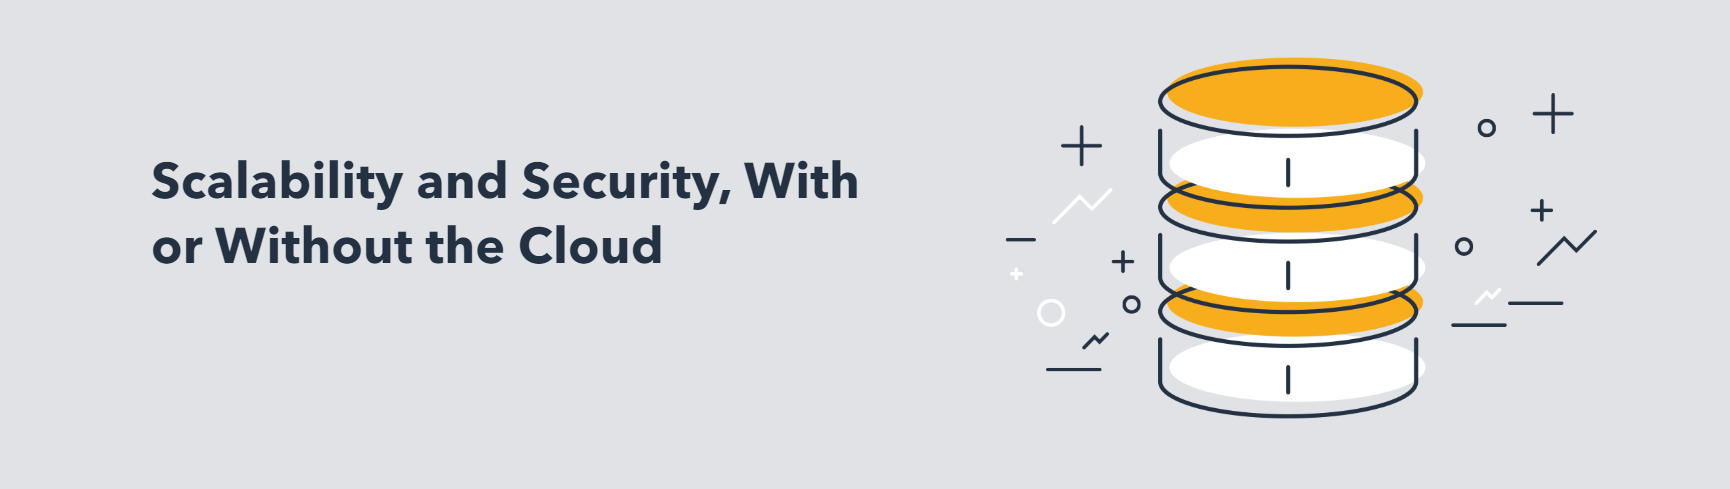 Scalability Security